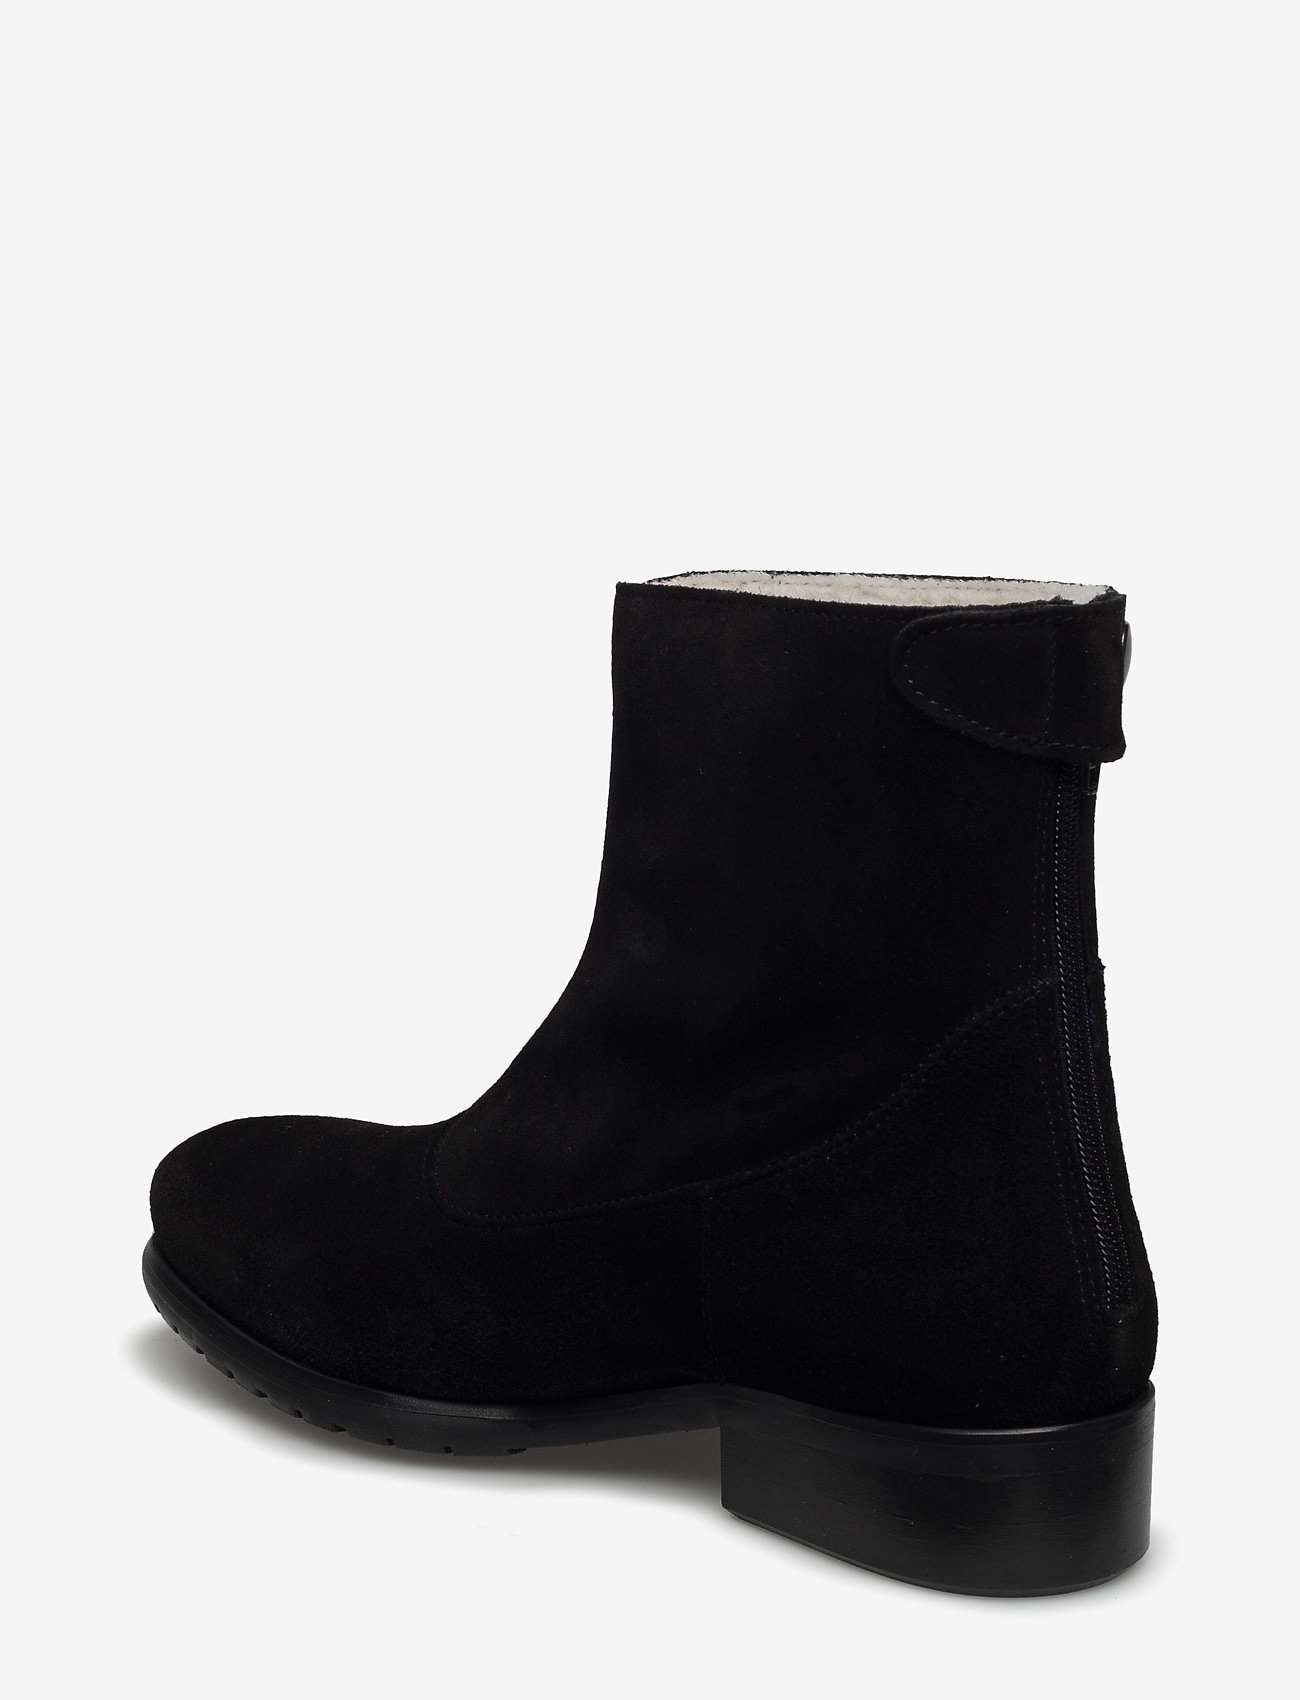 Boots (Black Suede 500) - Carla F